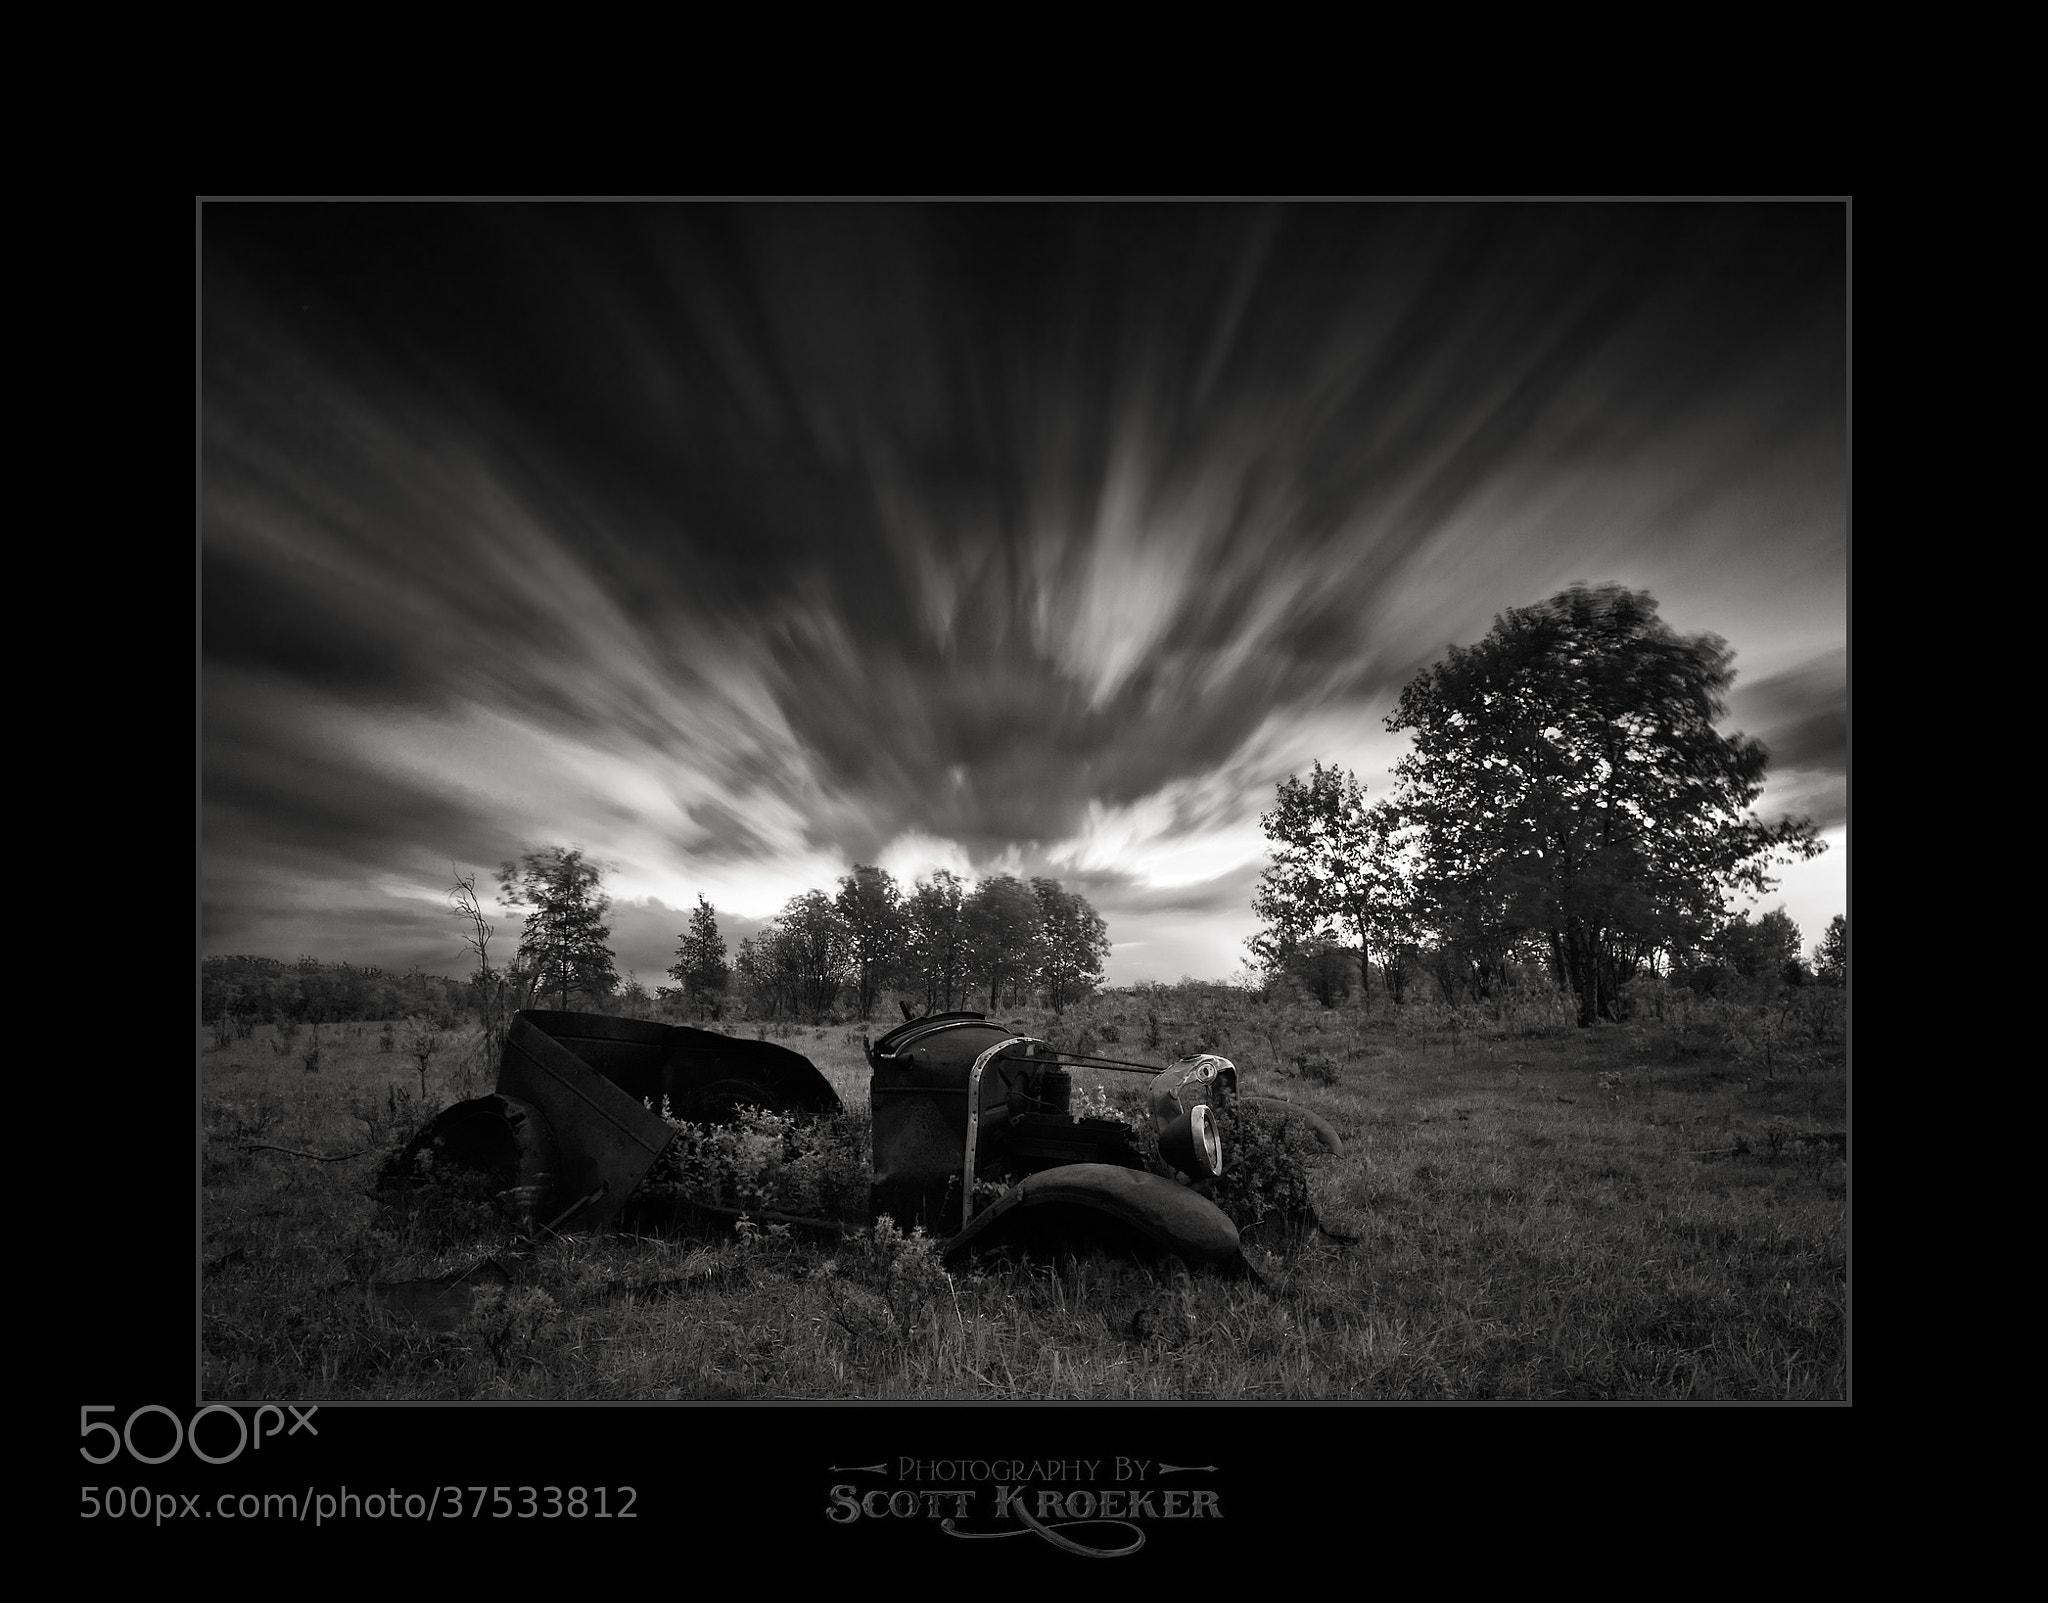 Photograph Blasting Through Time by Scott Kroeker on 500px